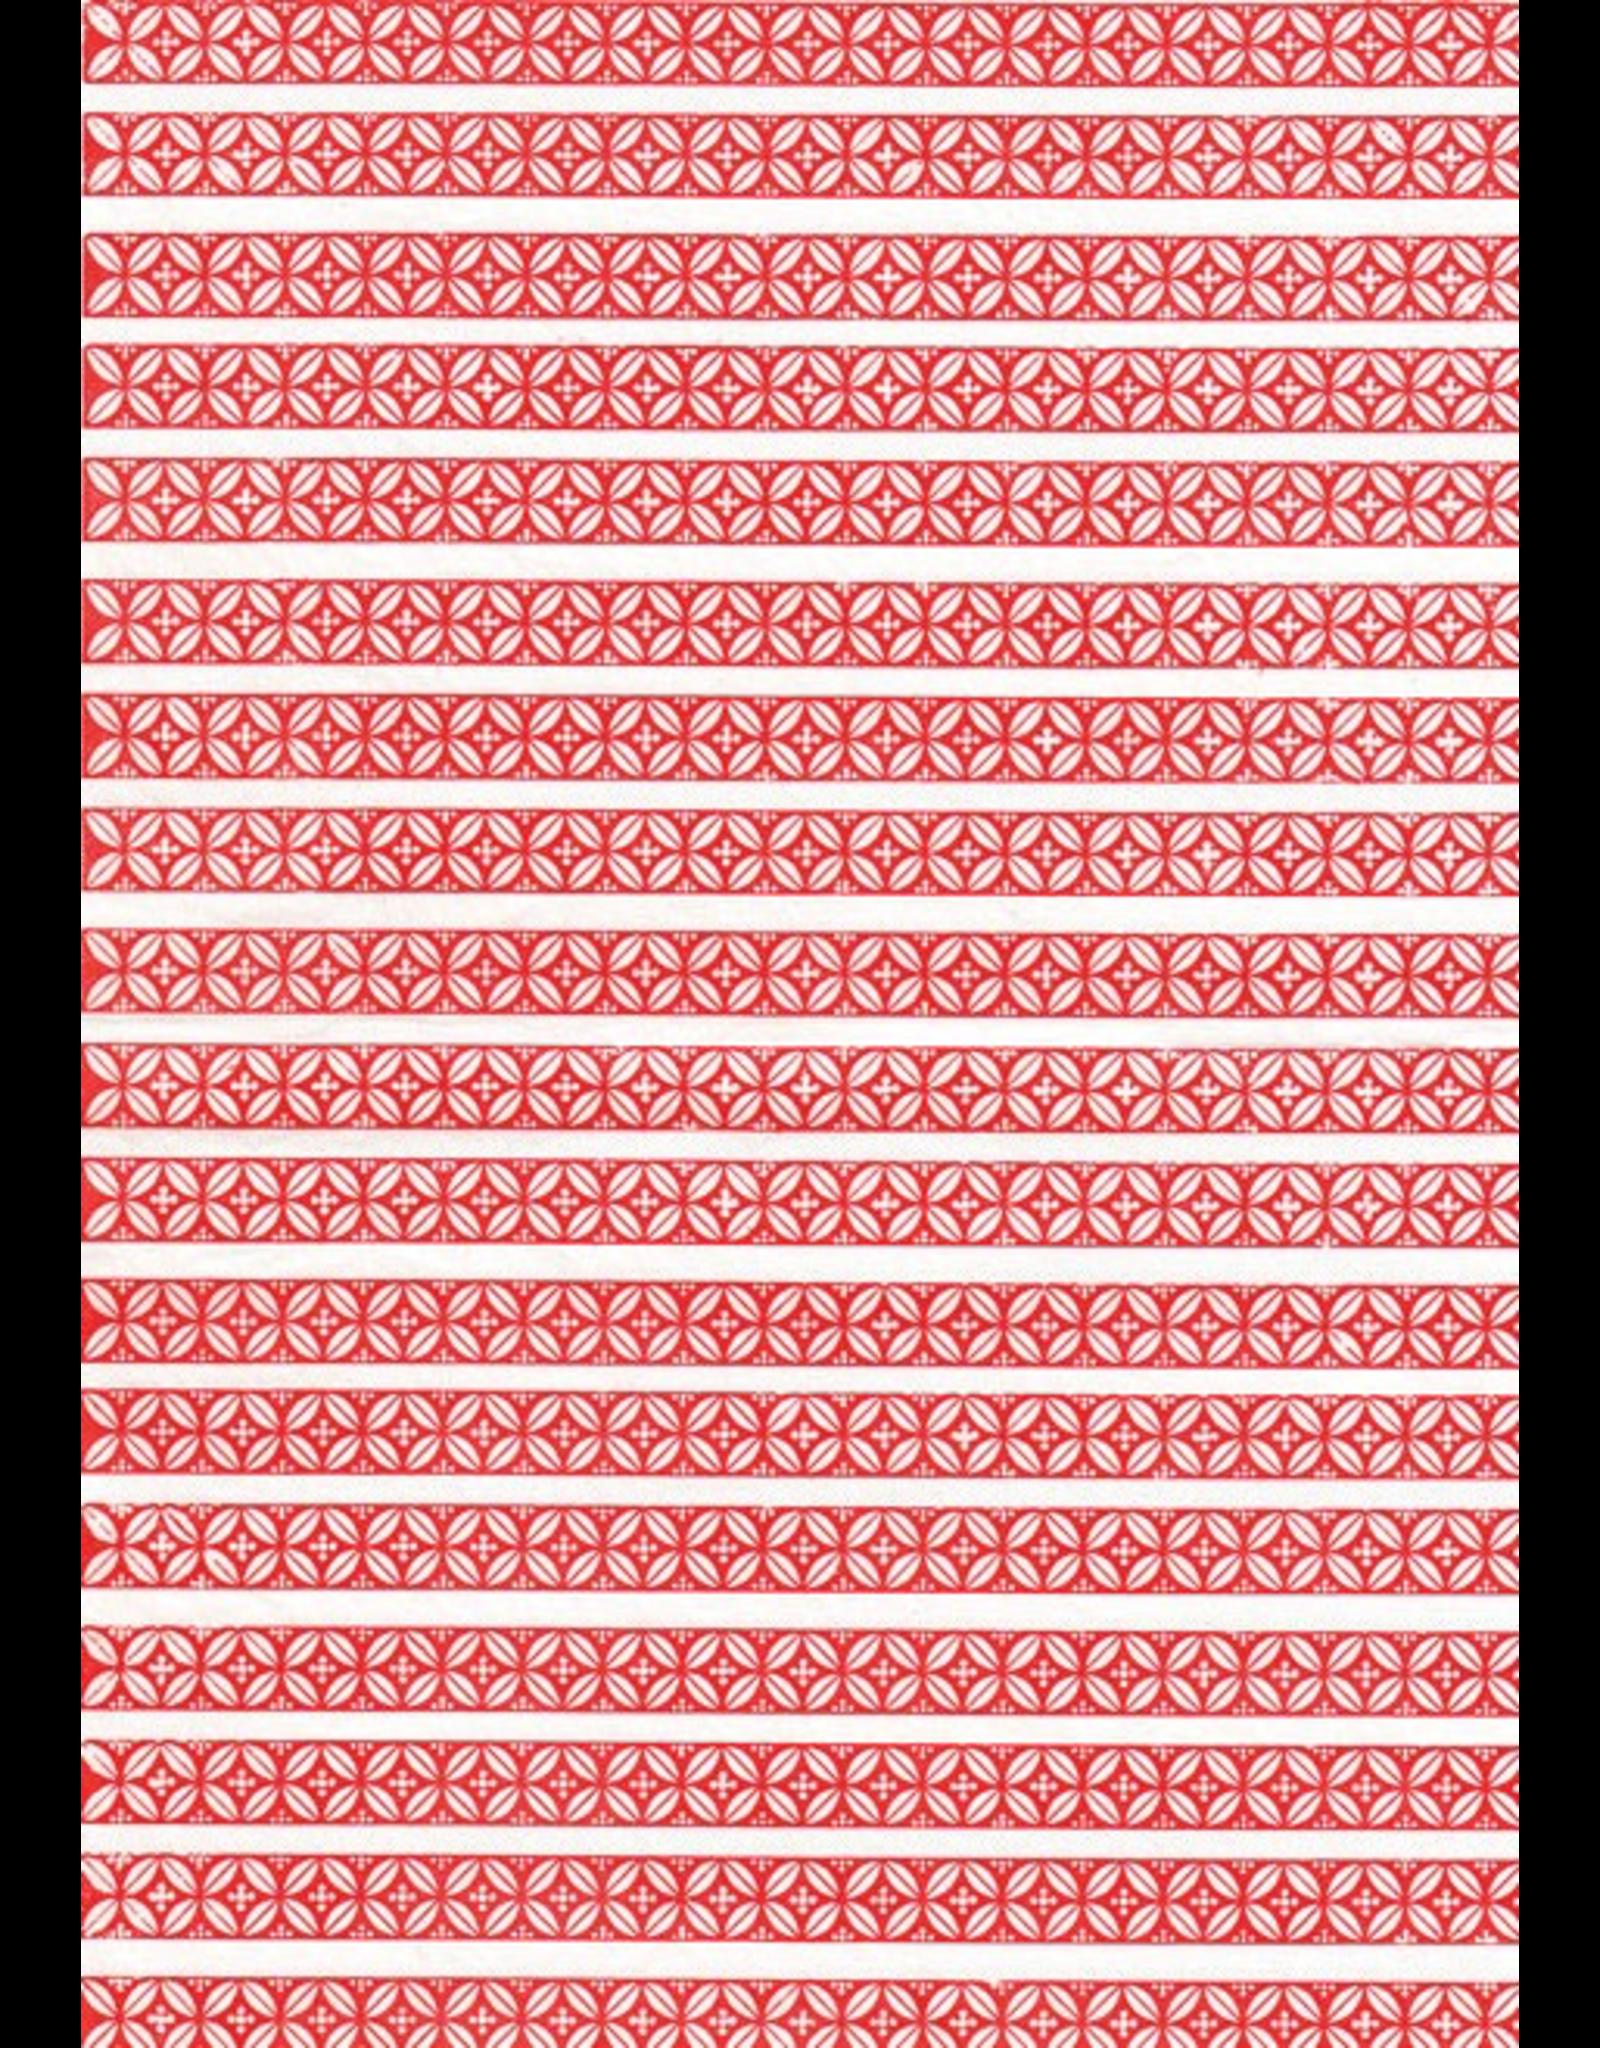 Sanbao Pattern decal 2